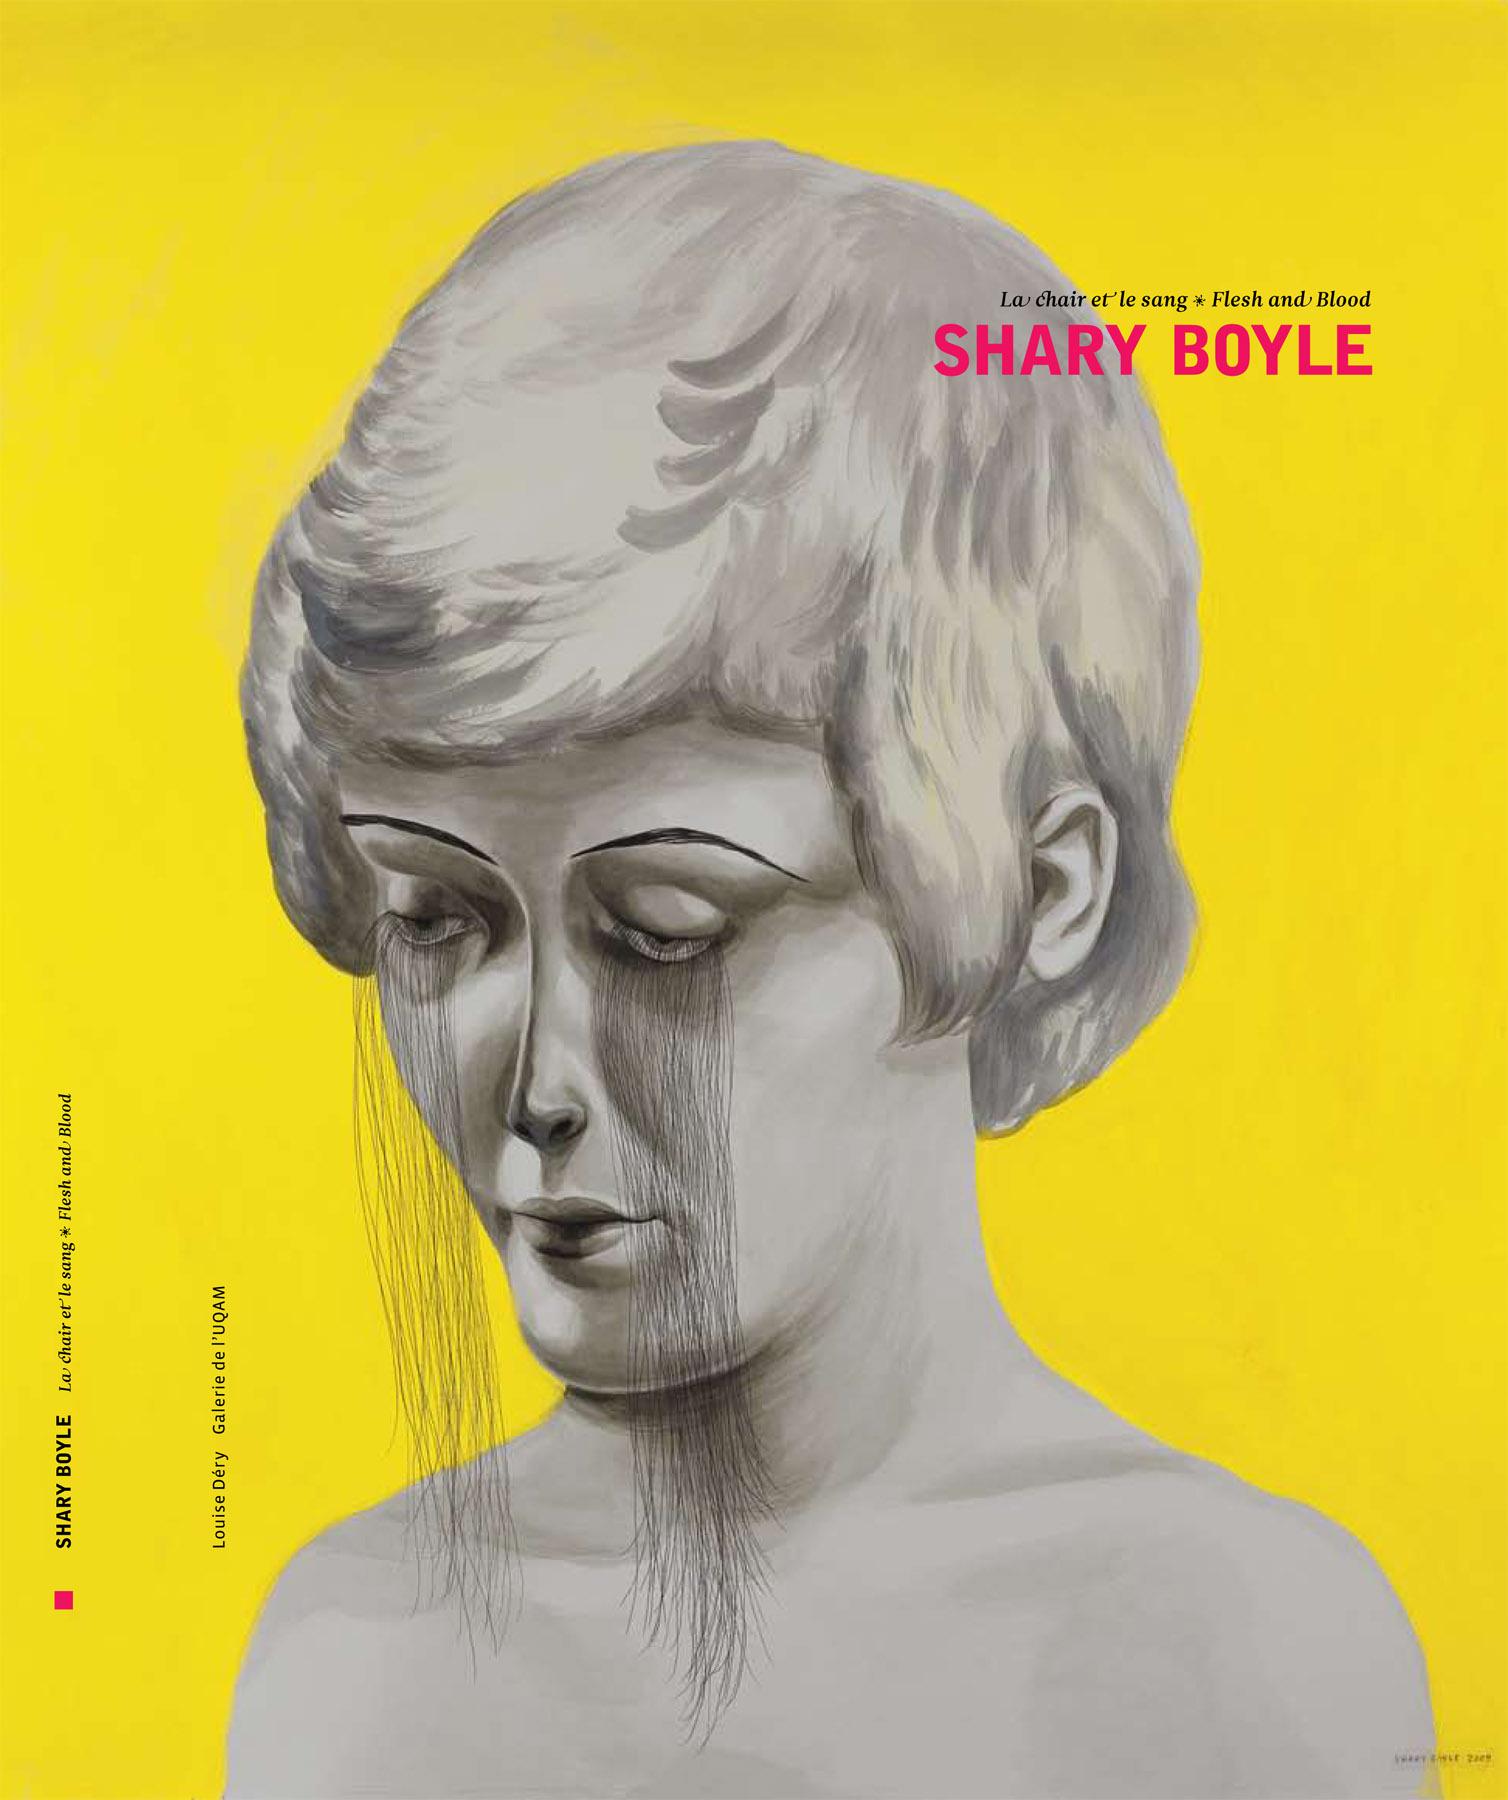 Publications | Shary Boyle